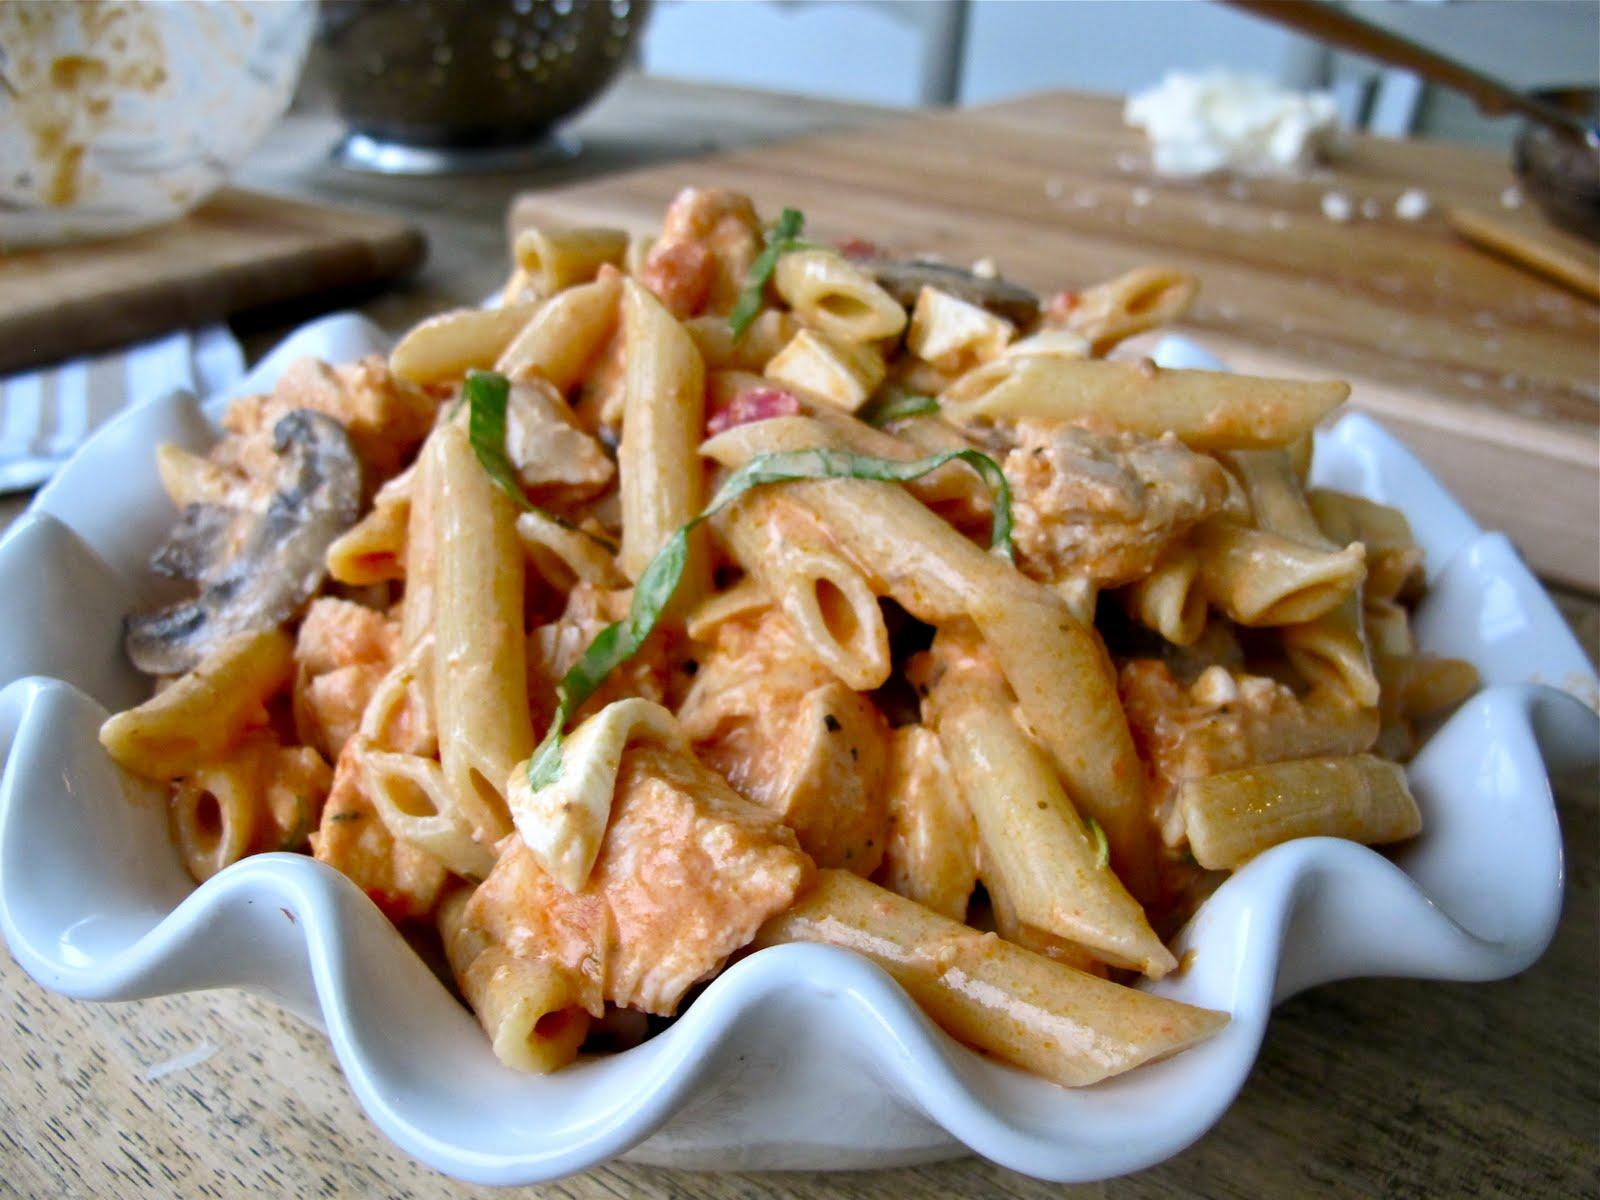 ... Pasta Pie | Chicken Tomato Cream Sauce Baked with Fresh Mozzarella